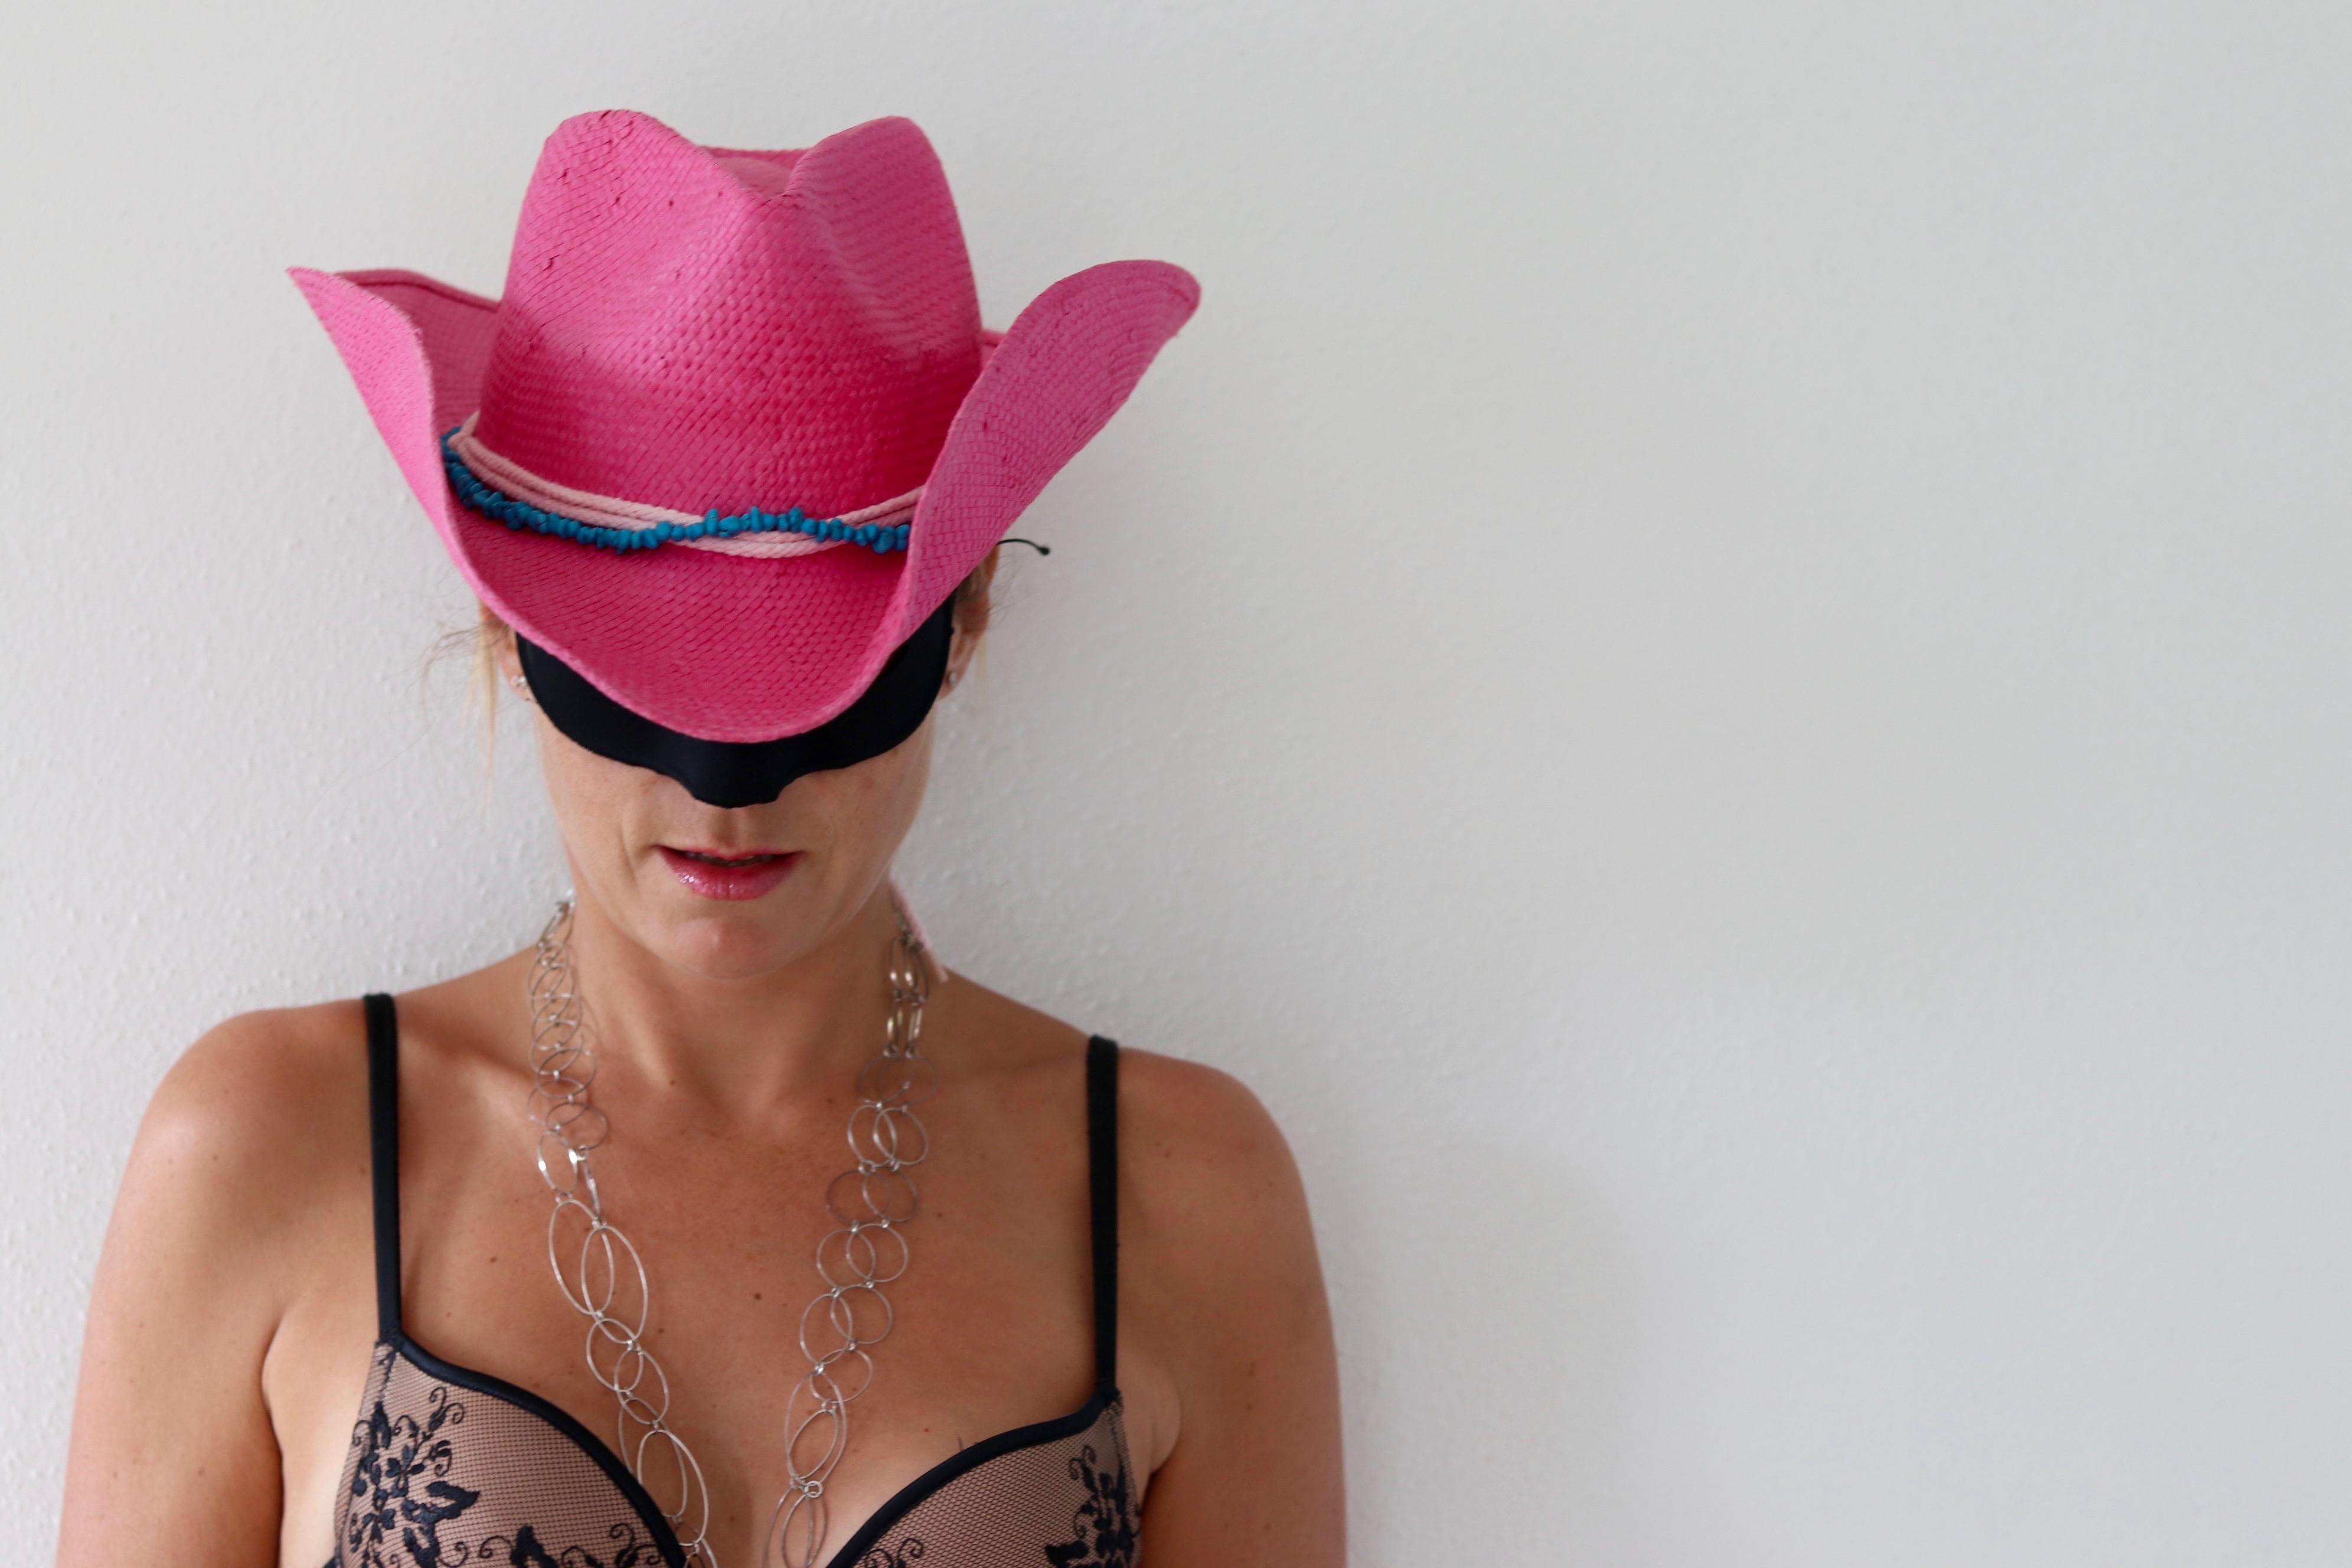 Sexycowboy